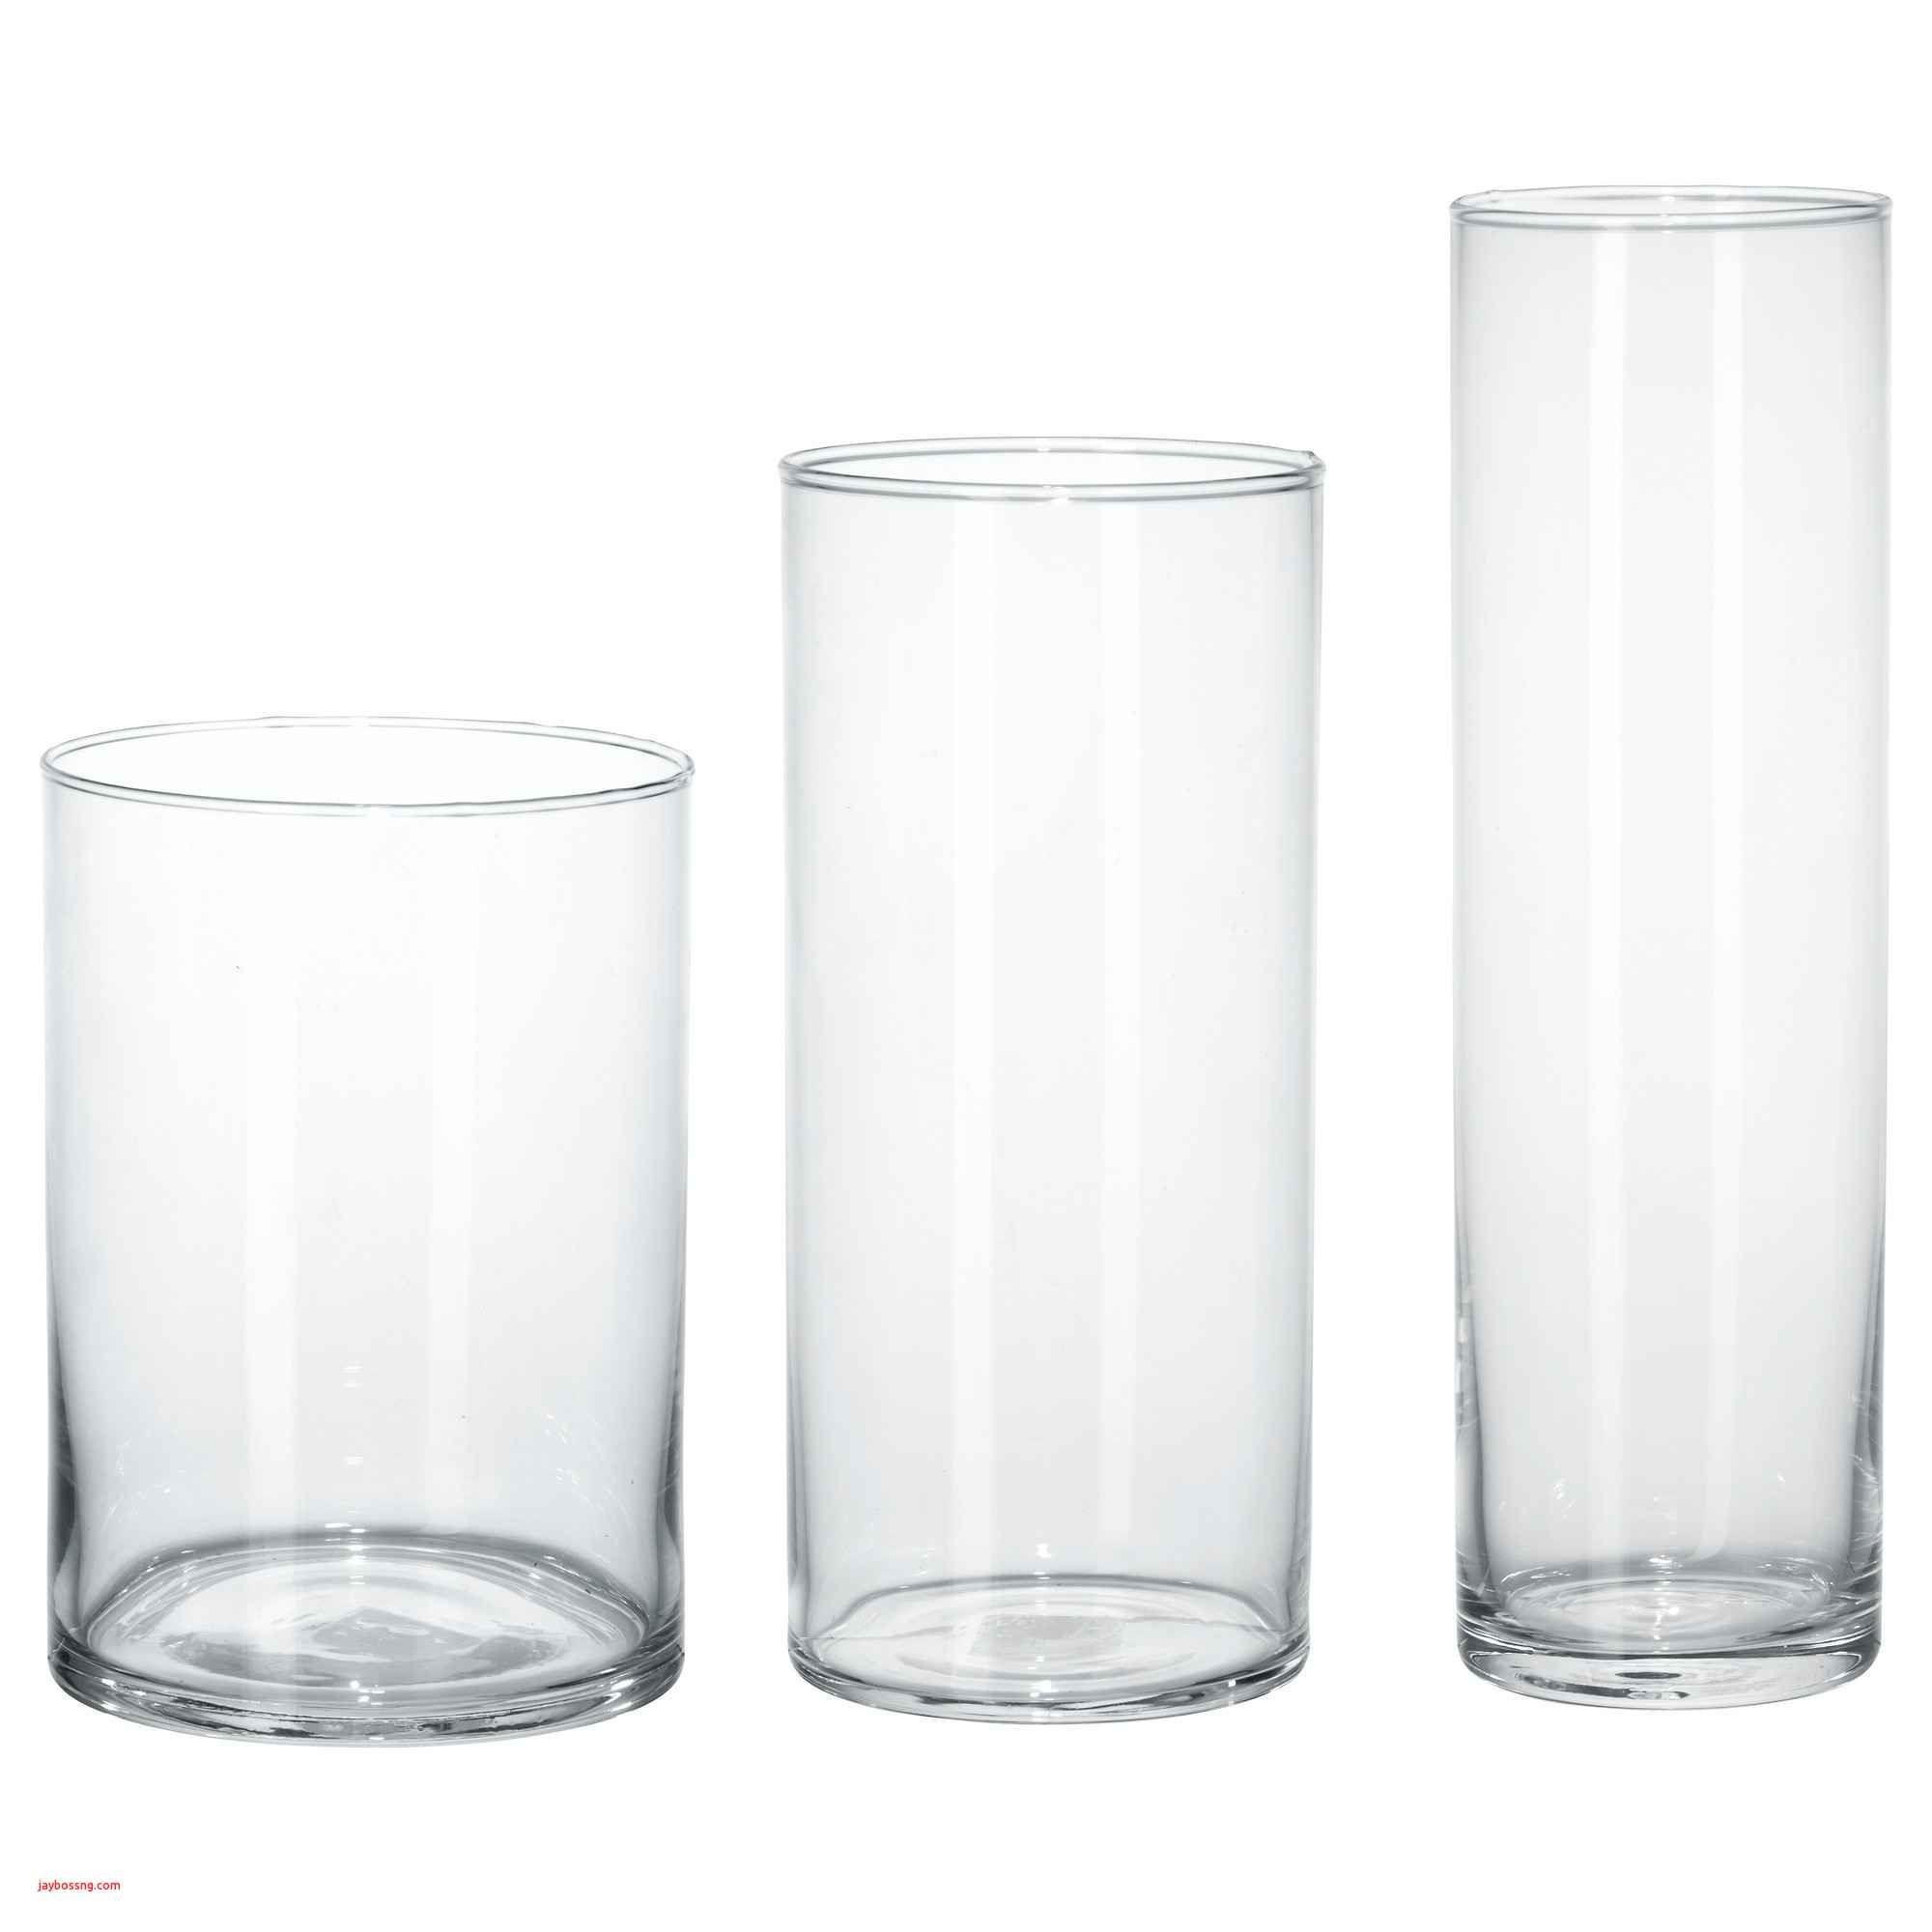 large turquoise vase of brown glass vase fresh ikea white table created pe s5h vases ikea throughout brown glass vase fresh ikea white table created pe s5h vases ikea vase i 0d bladet